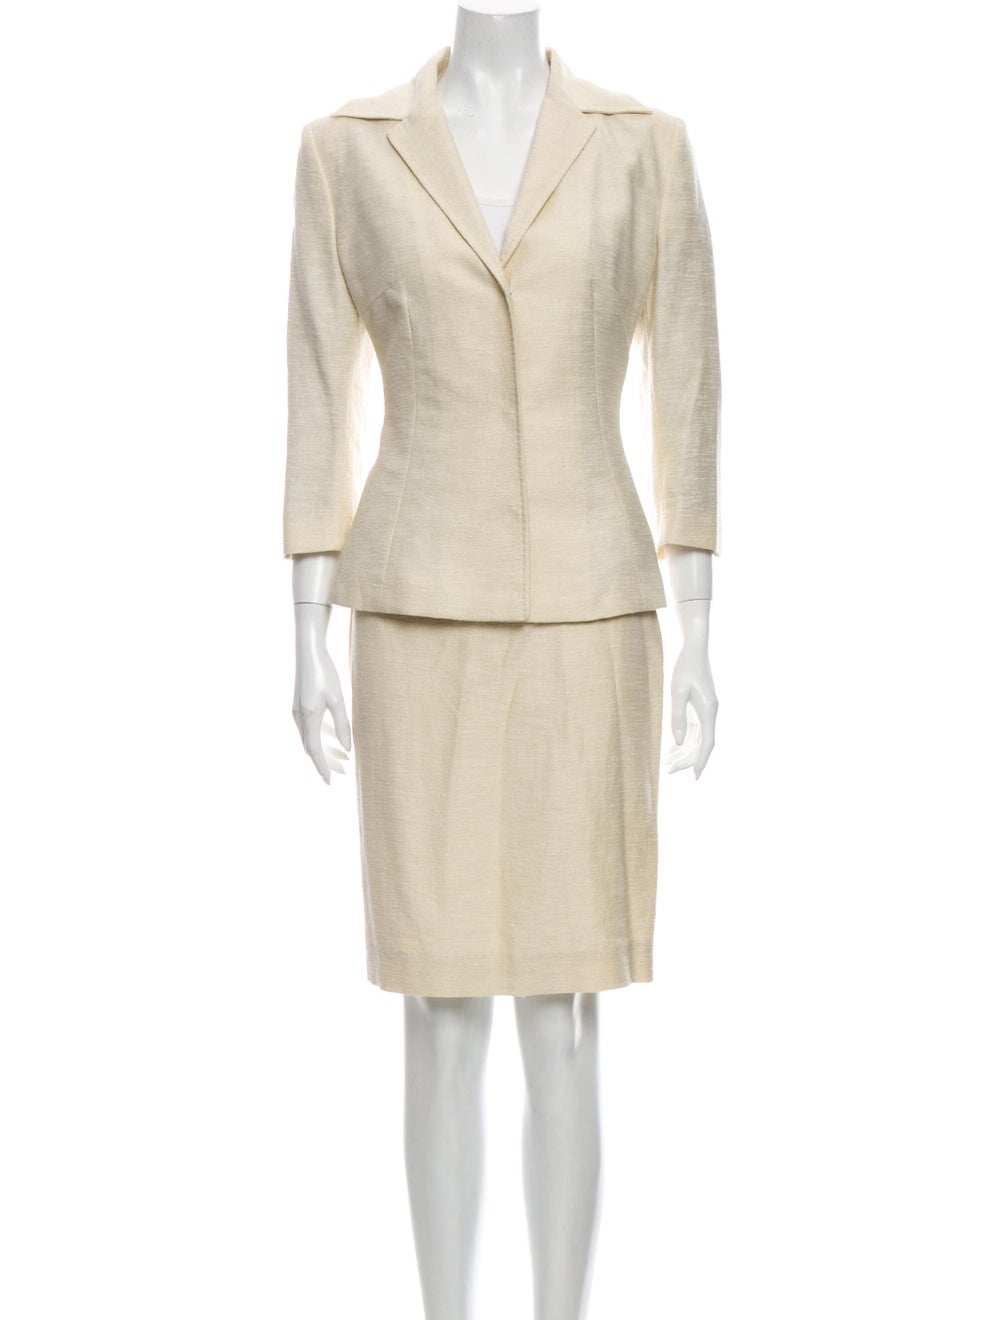 Dolce & Gabbana Linen Skirt Suit - image 1